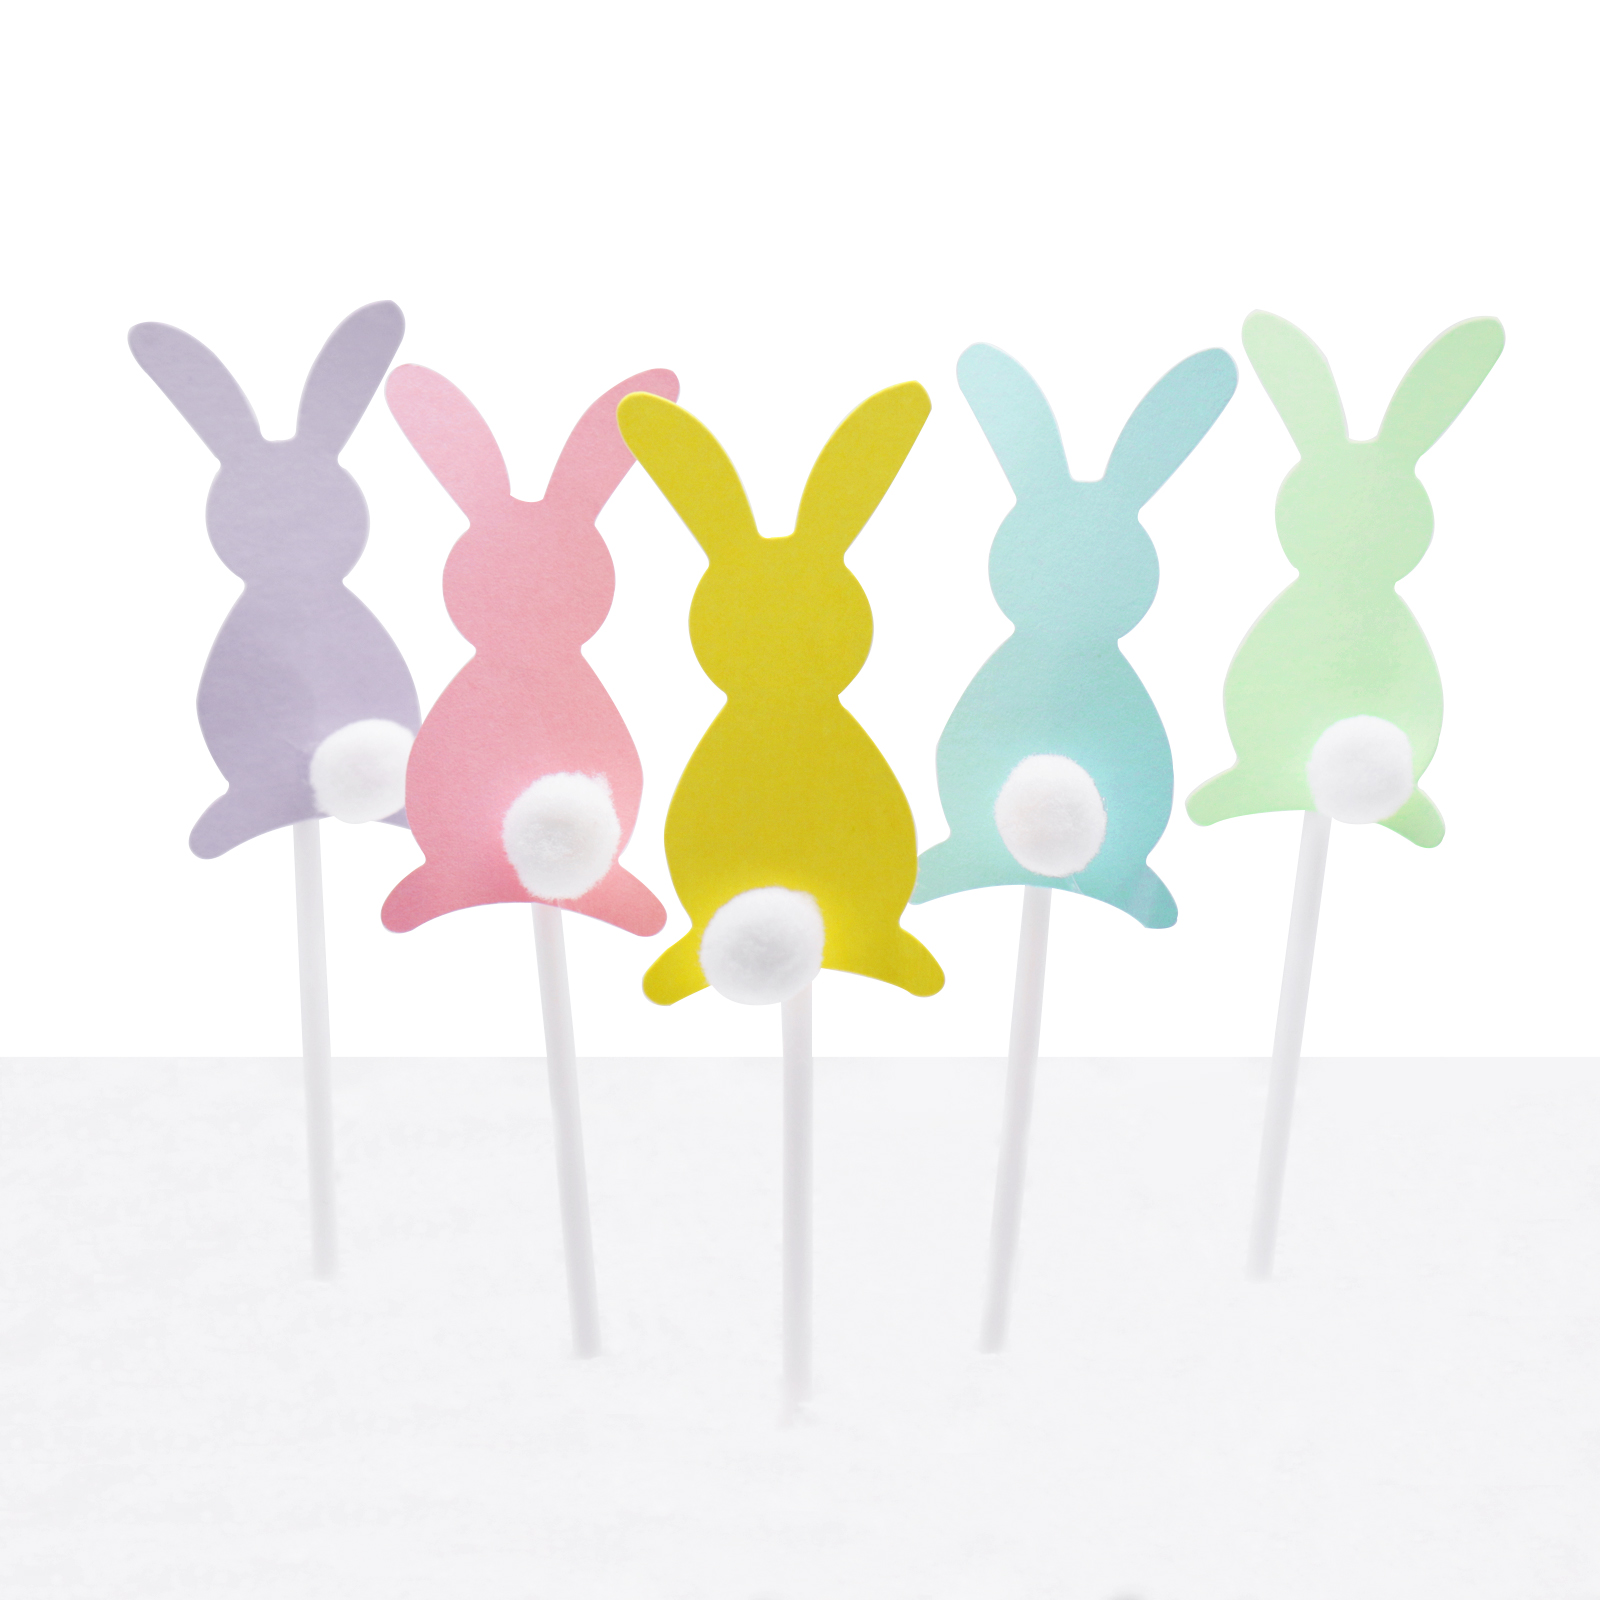 5pcs/set Cartoon Bunny Cupcake Wrapper Birthday Party Decorations Kids Cute Rabbit Birthday Cake Topper Baby Shower Girl